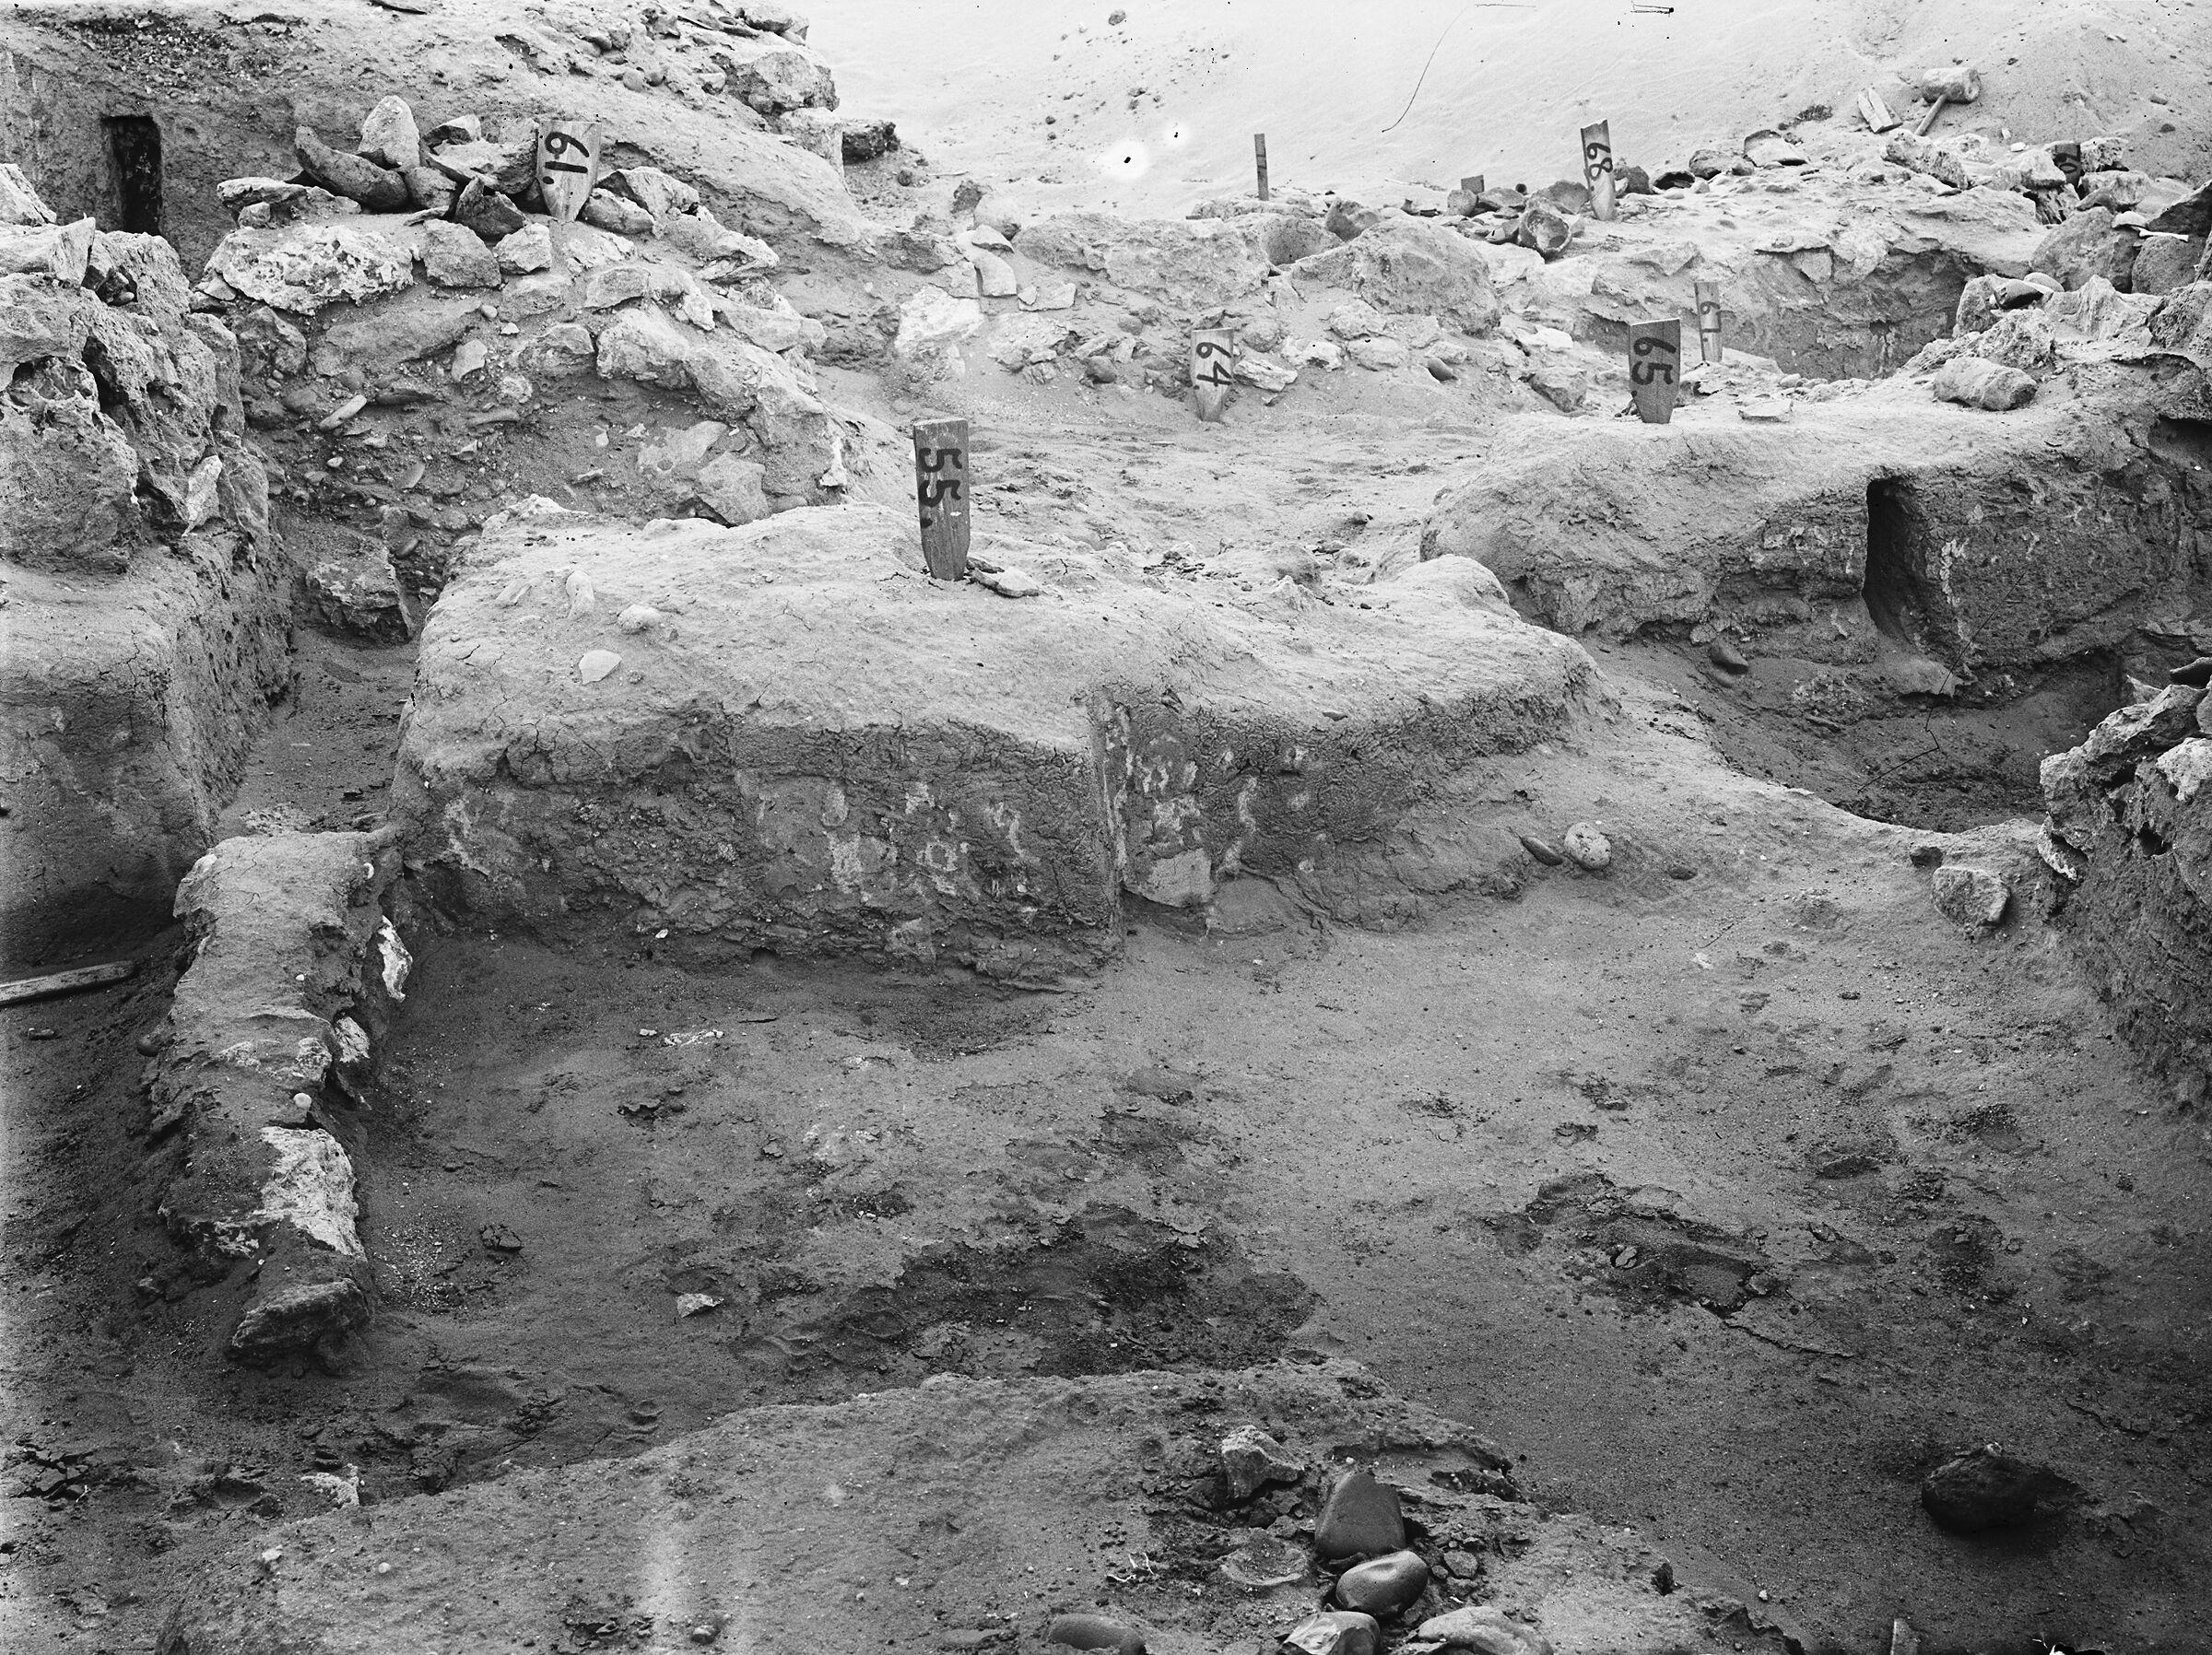 Wadi Cemetery (Reisner; north of W. Cem): Site: Giza; View: GW 54, GW 55, GW 57, GW 61, GW 64, GW 65, GW 67, GW 68